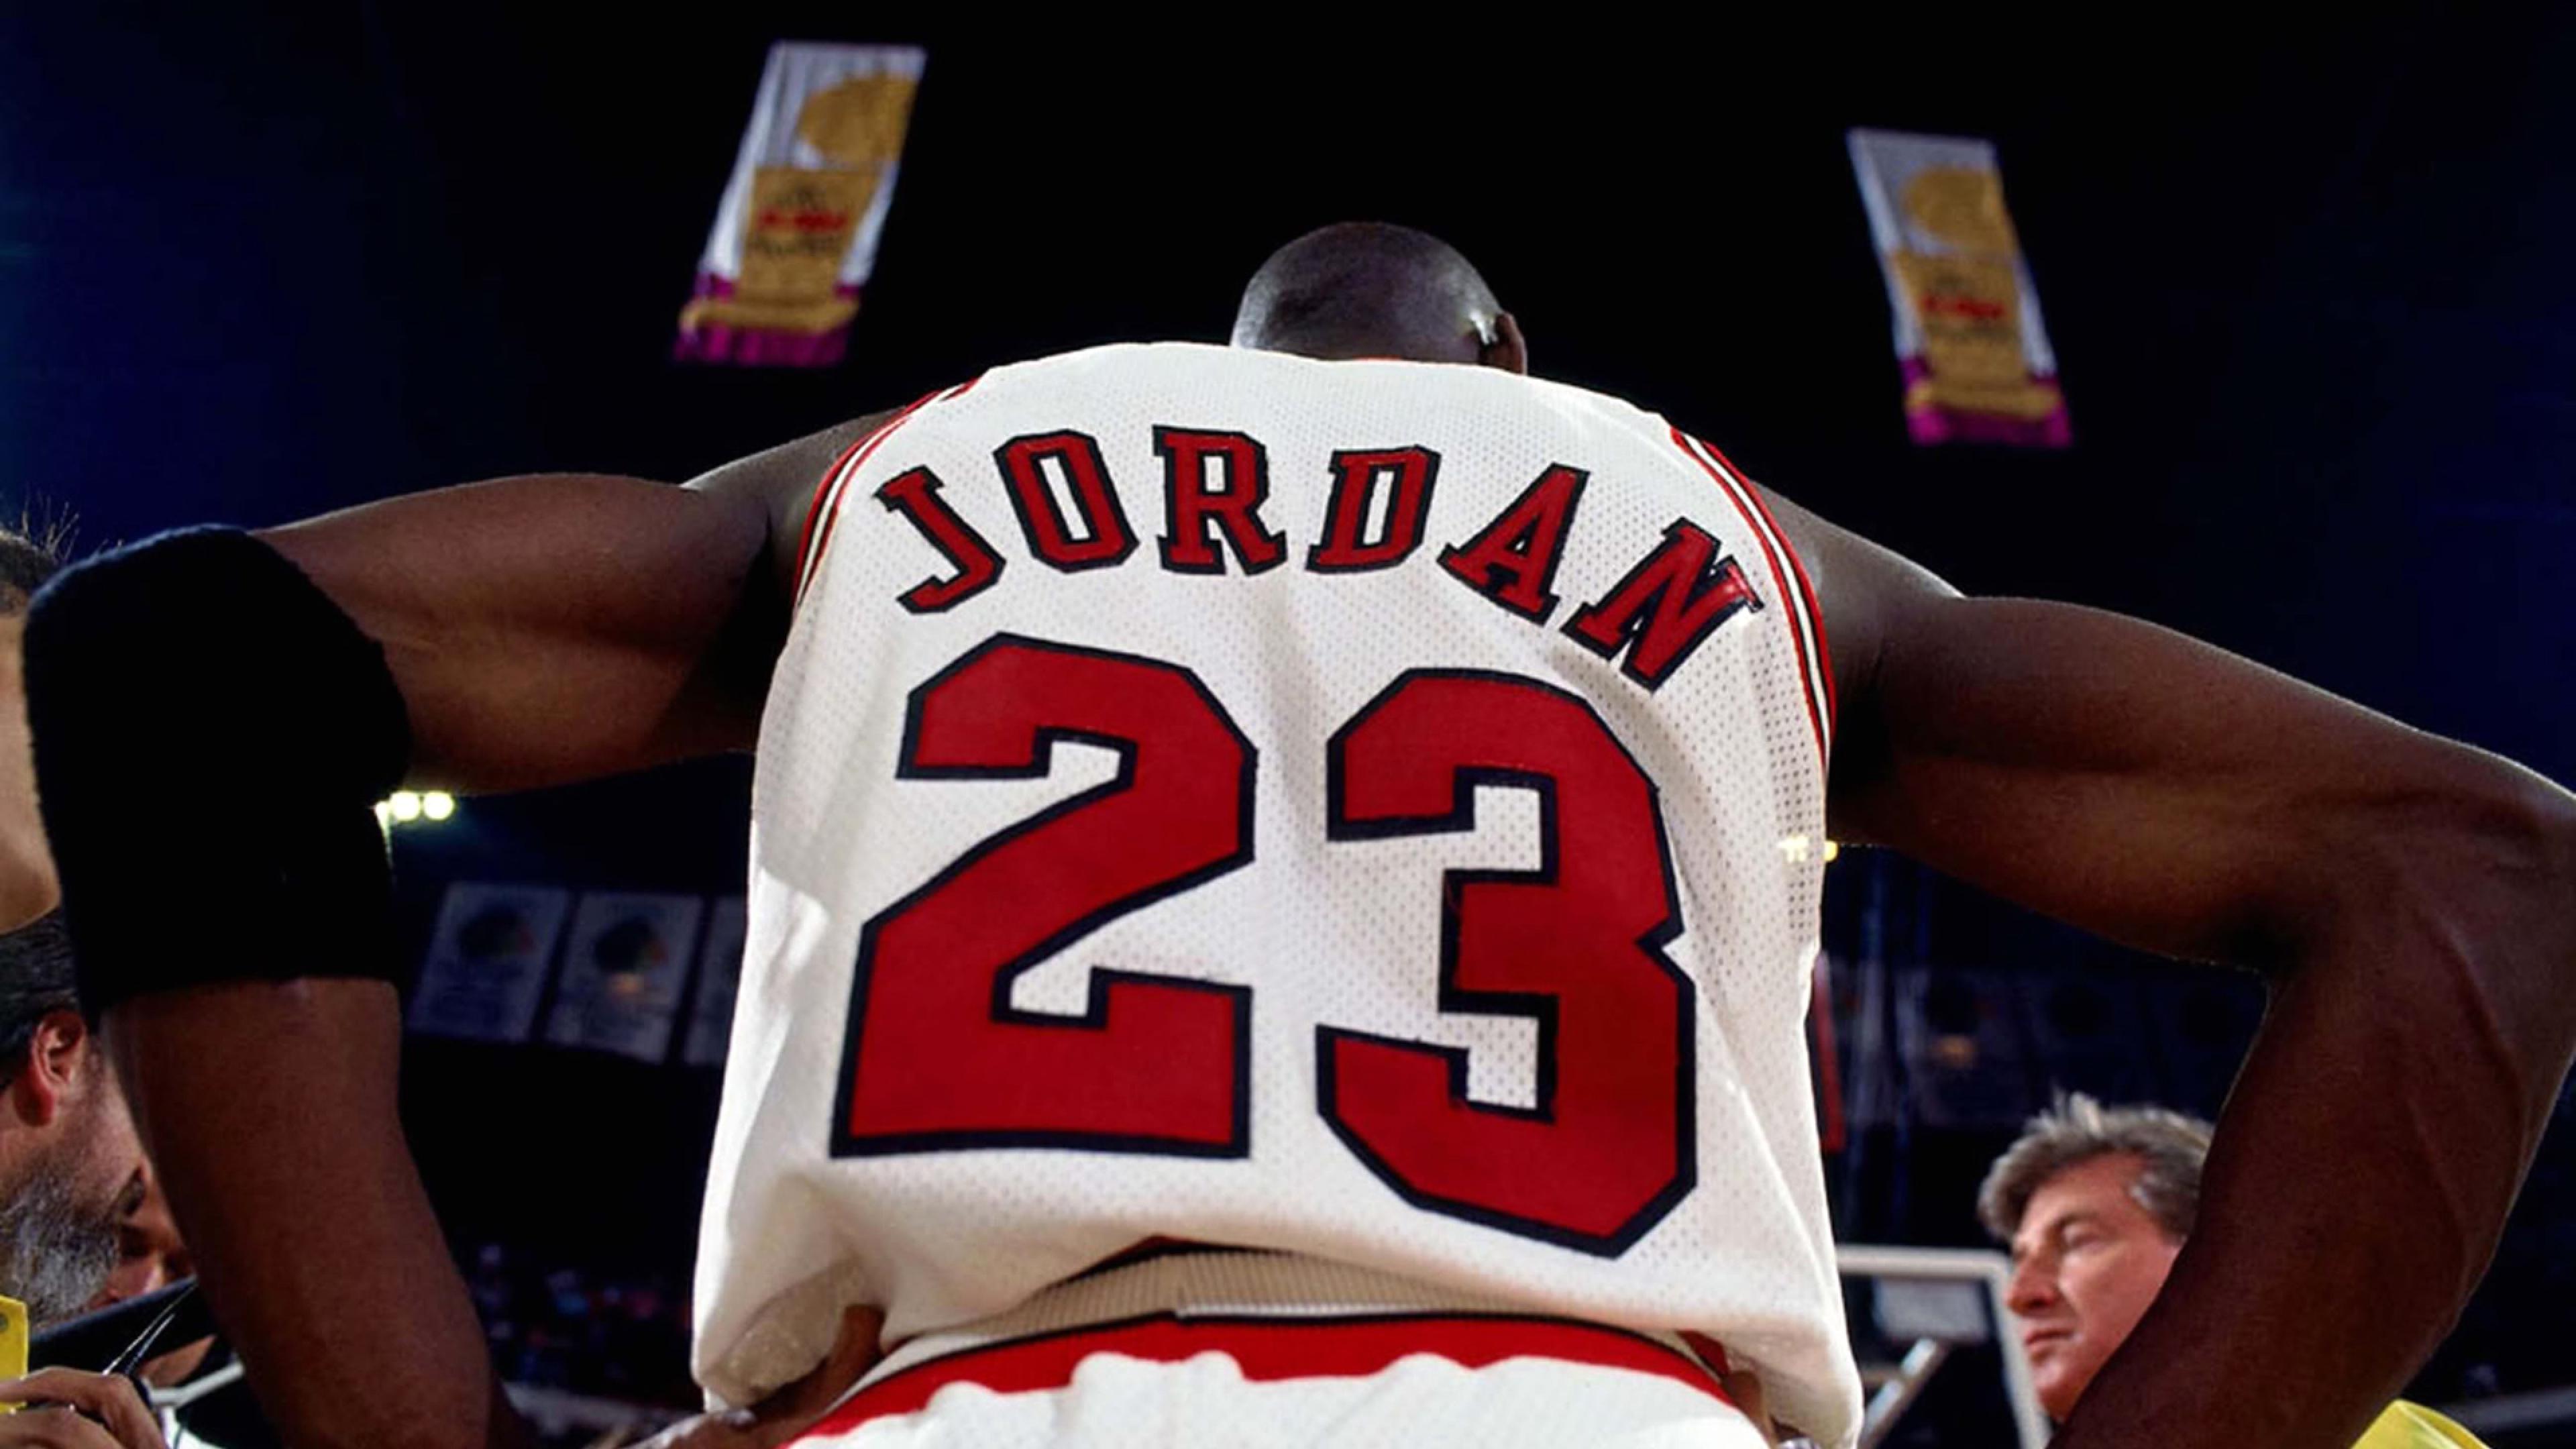 3840x2160 Michael jordan Nba Basketball Jersey Logo Wallpaper 3840x2160